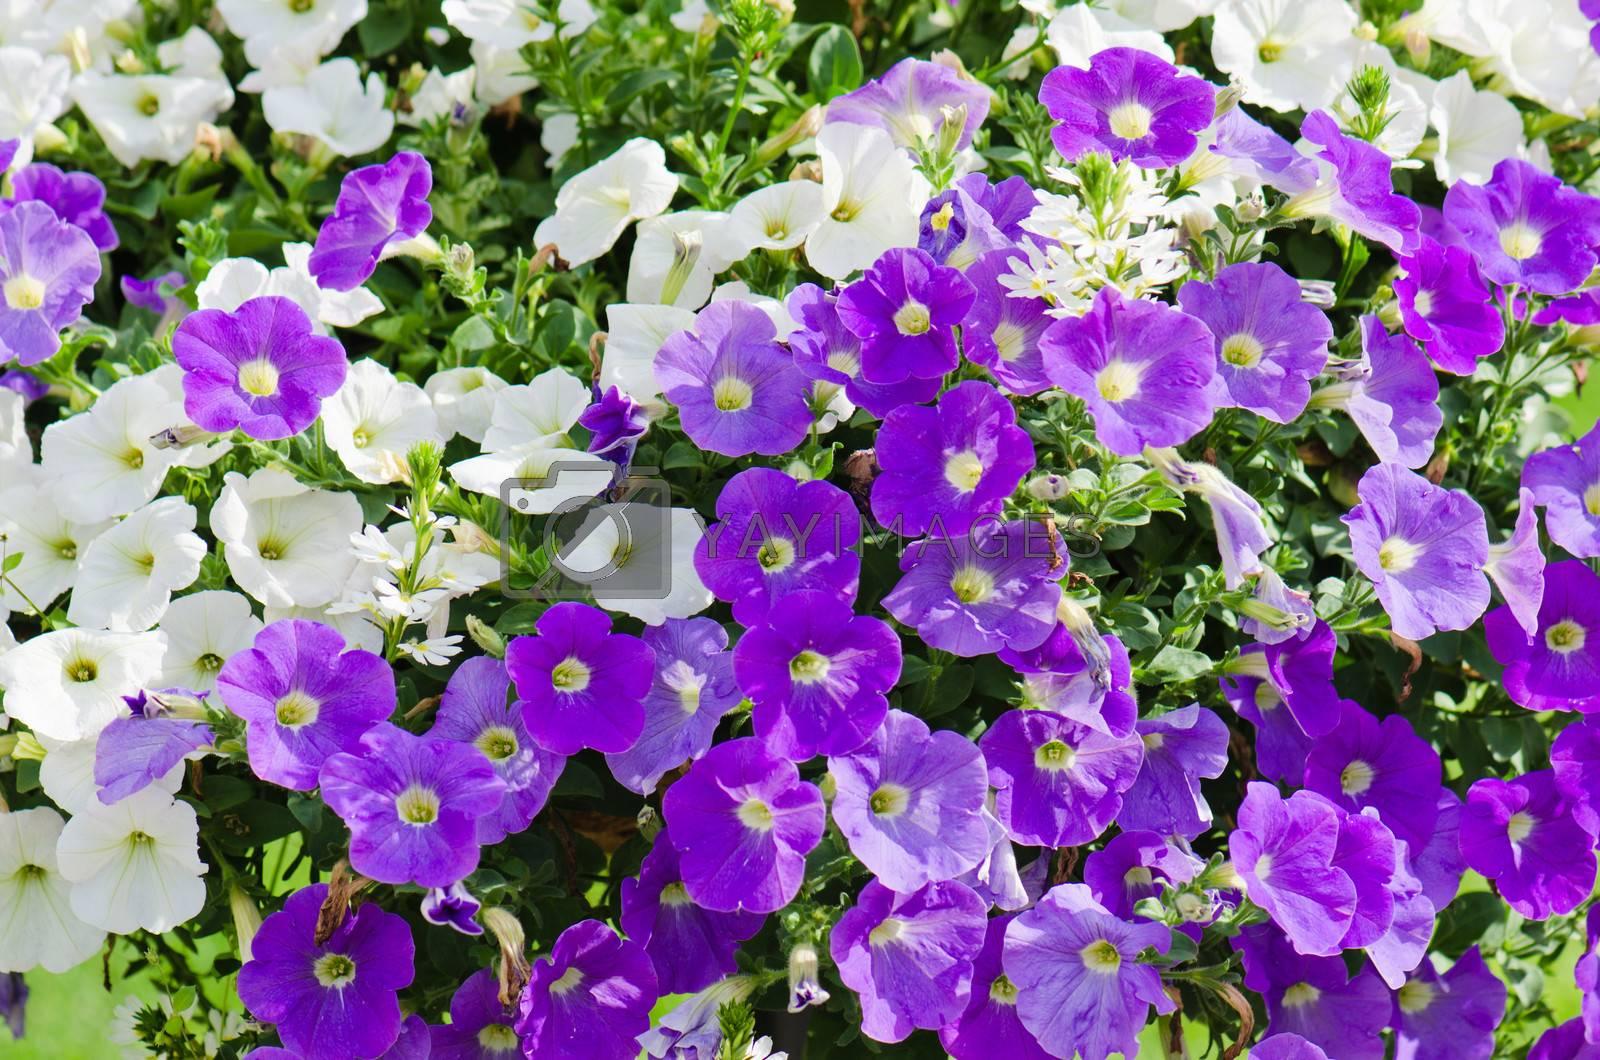 Beautiful white and purple petunia flowers close up